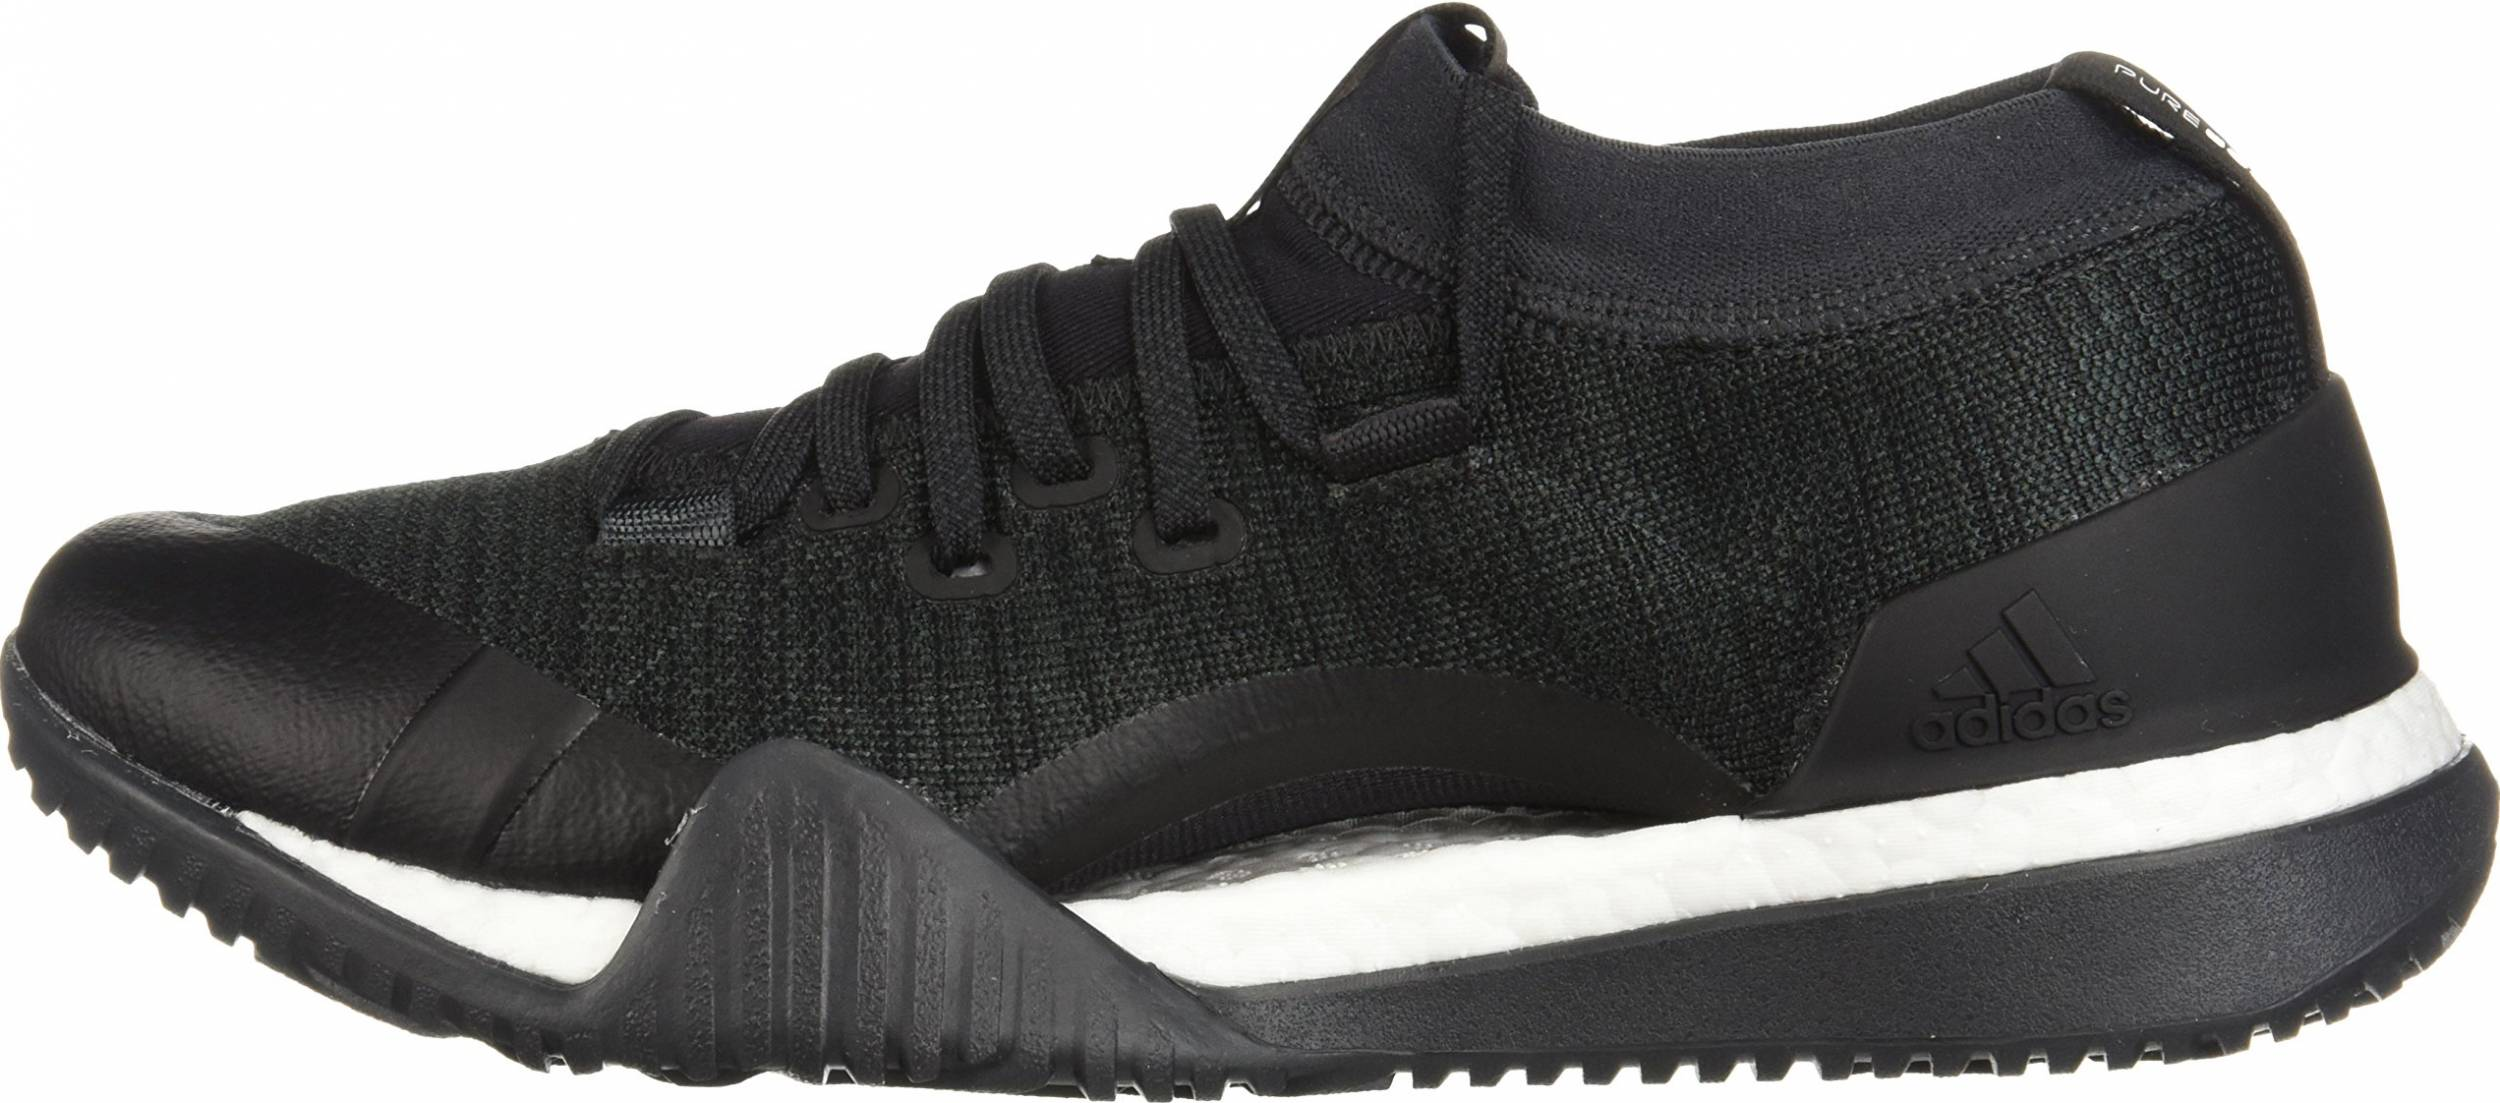 Adidas Pureboost X TR 3.0 - Deals ($54), Facts, Reviews (2021 ...